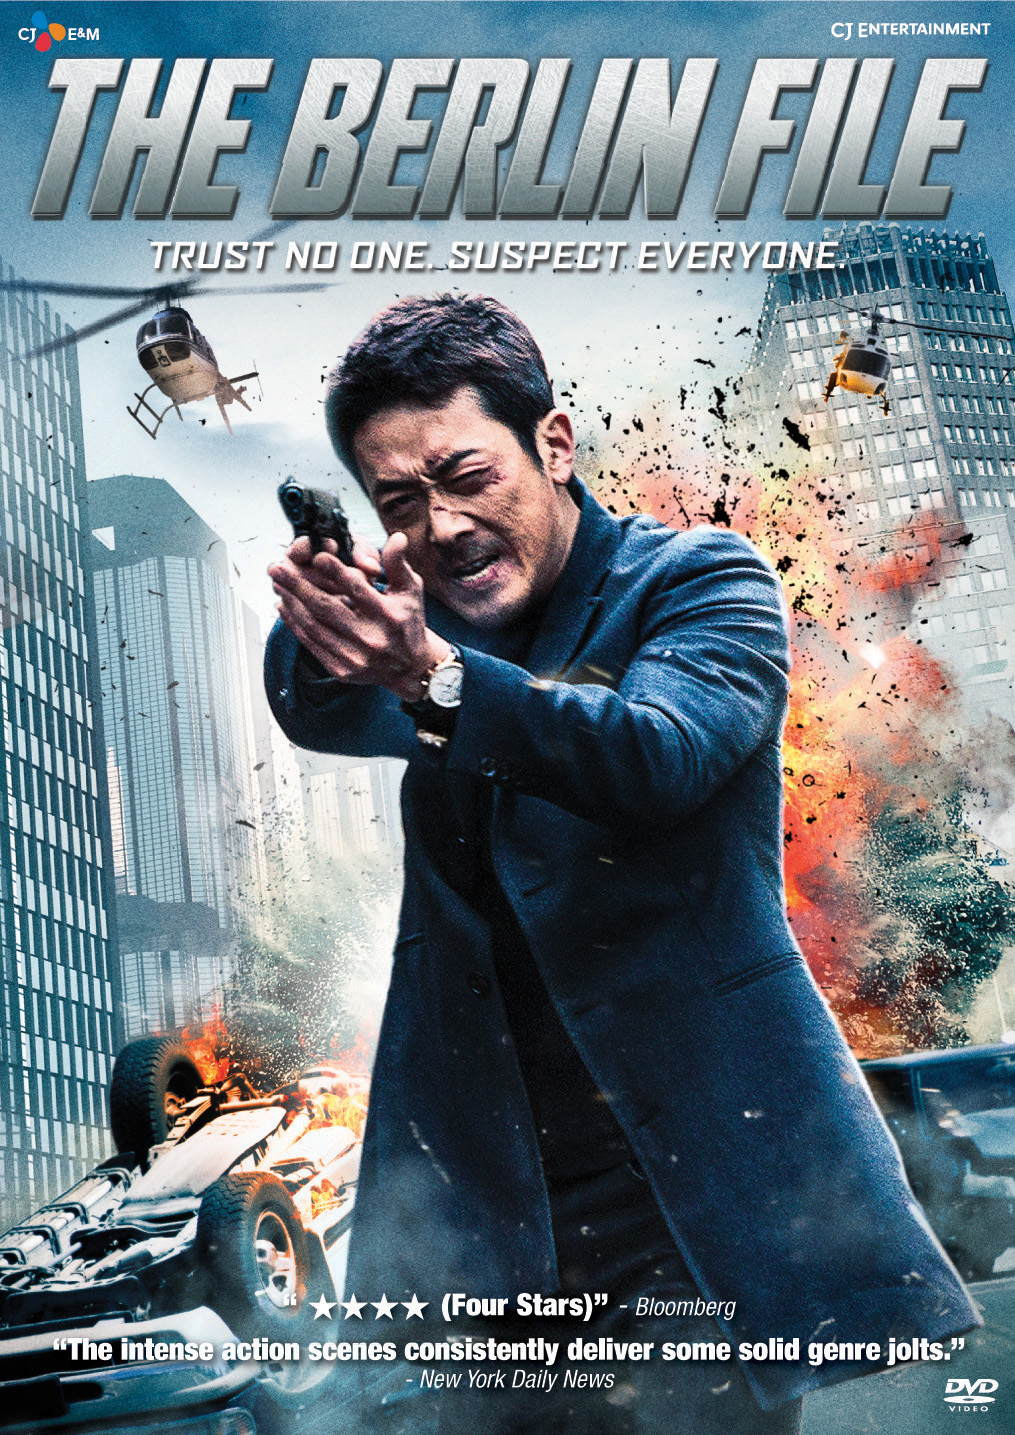 Korean Film The Berlin File To Be Released On Region 1 Dvd